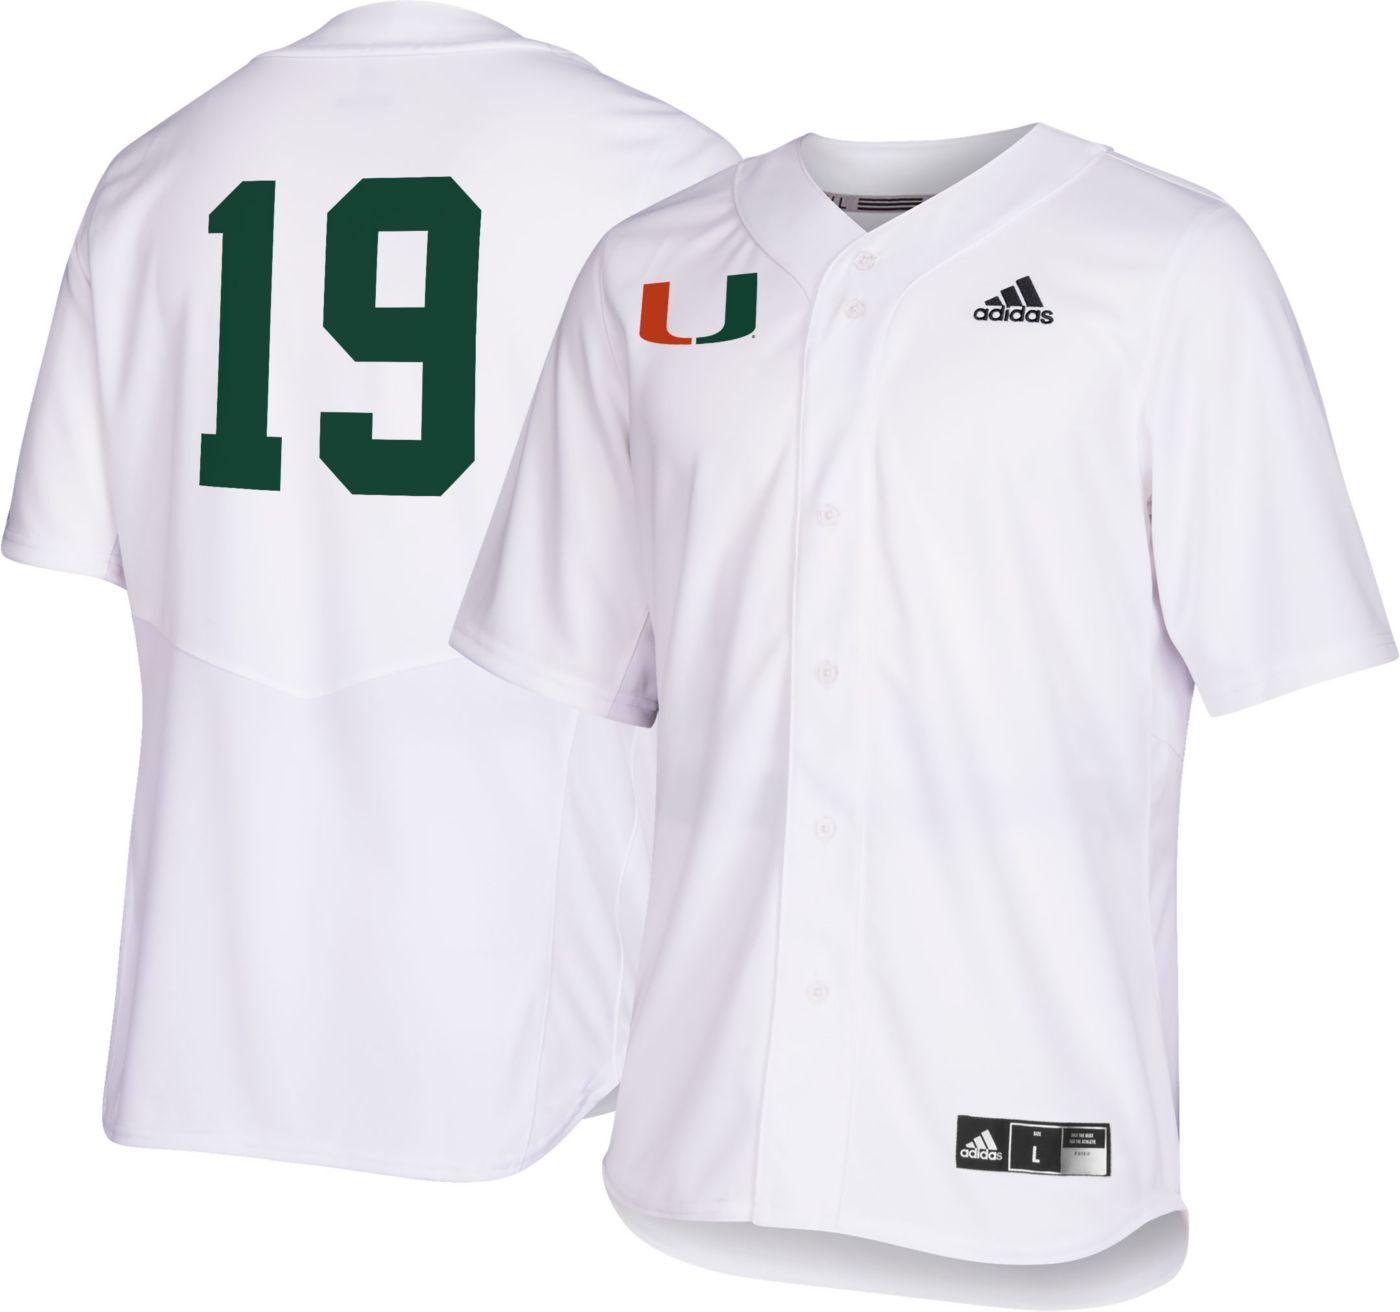 adidas Men's Miami Hurricanes #19 Replica Baseball White Jersey